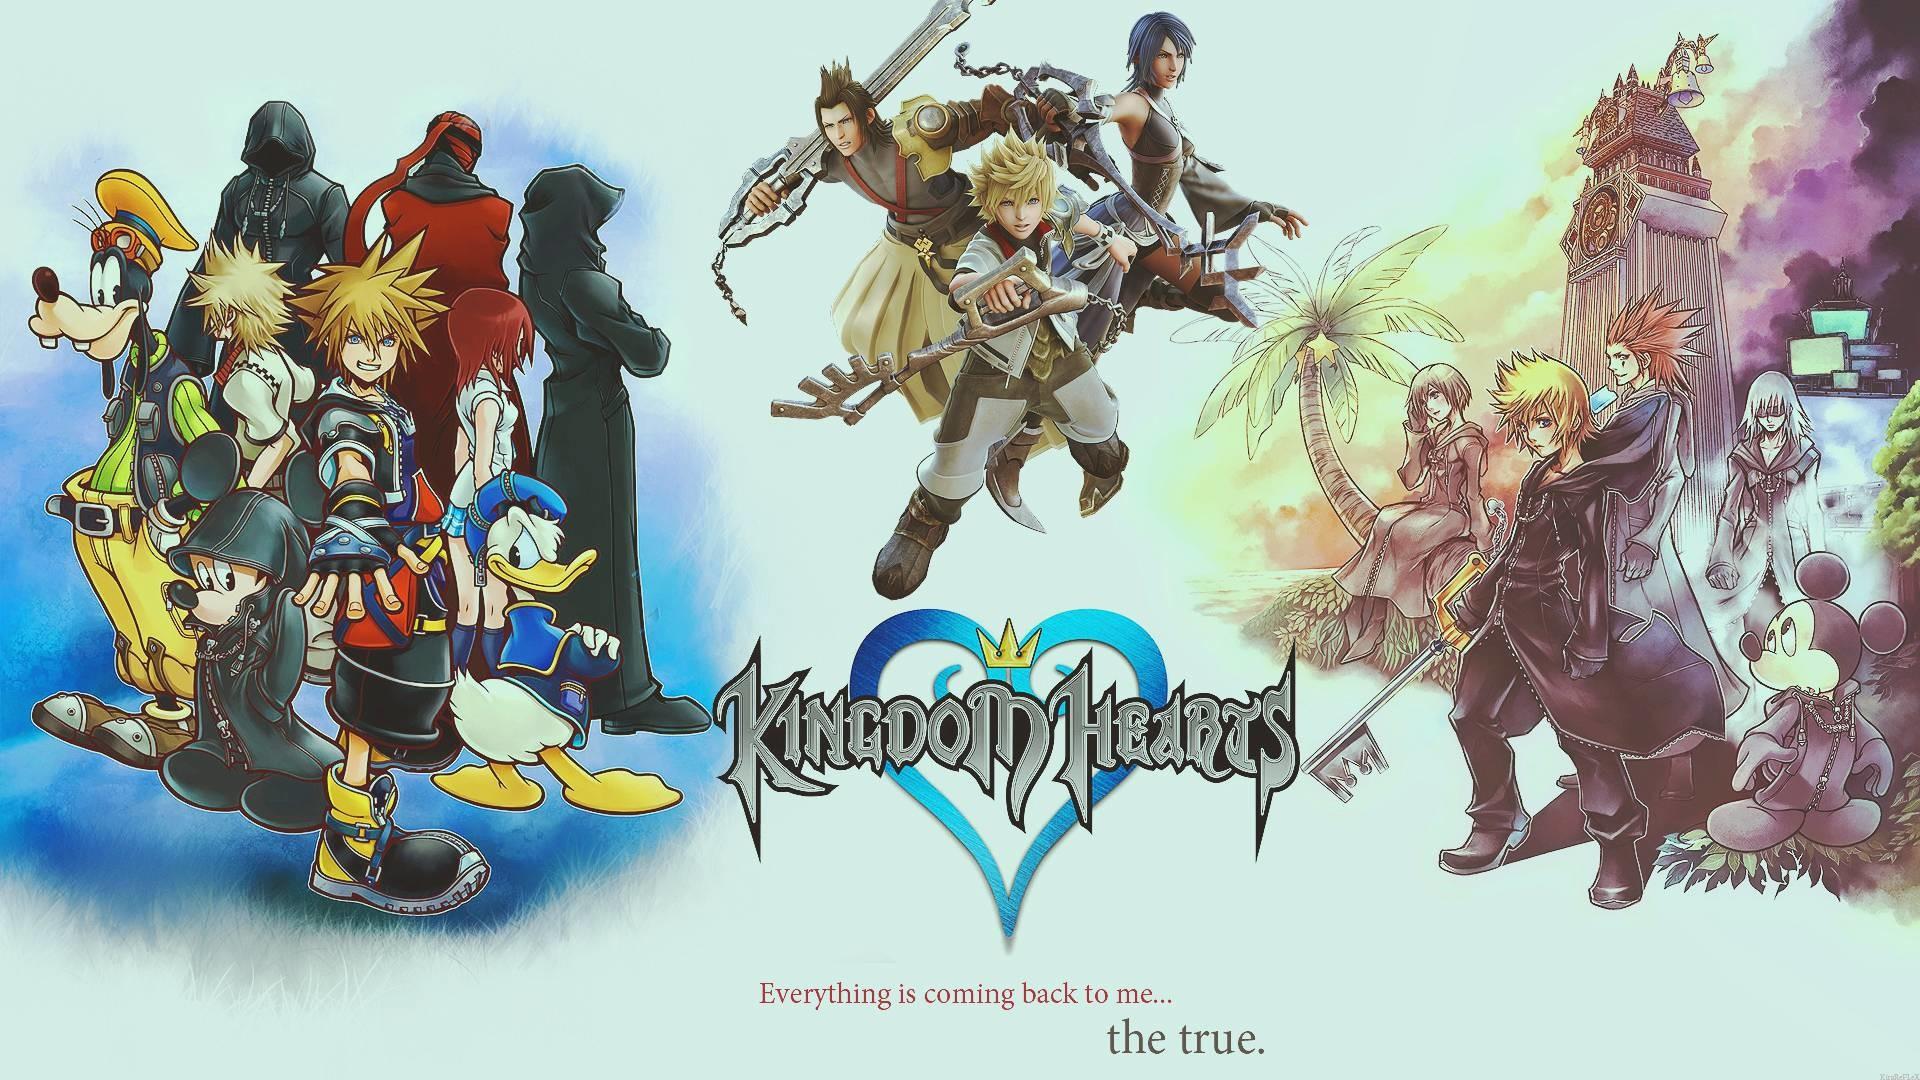 Kingdom Hearts Wallpaper Hd - Kingdom Hearts 358 2 Days Title Screen - HD Wallpaper